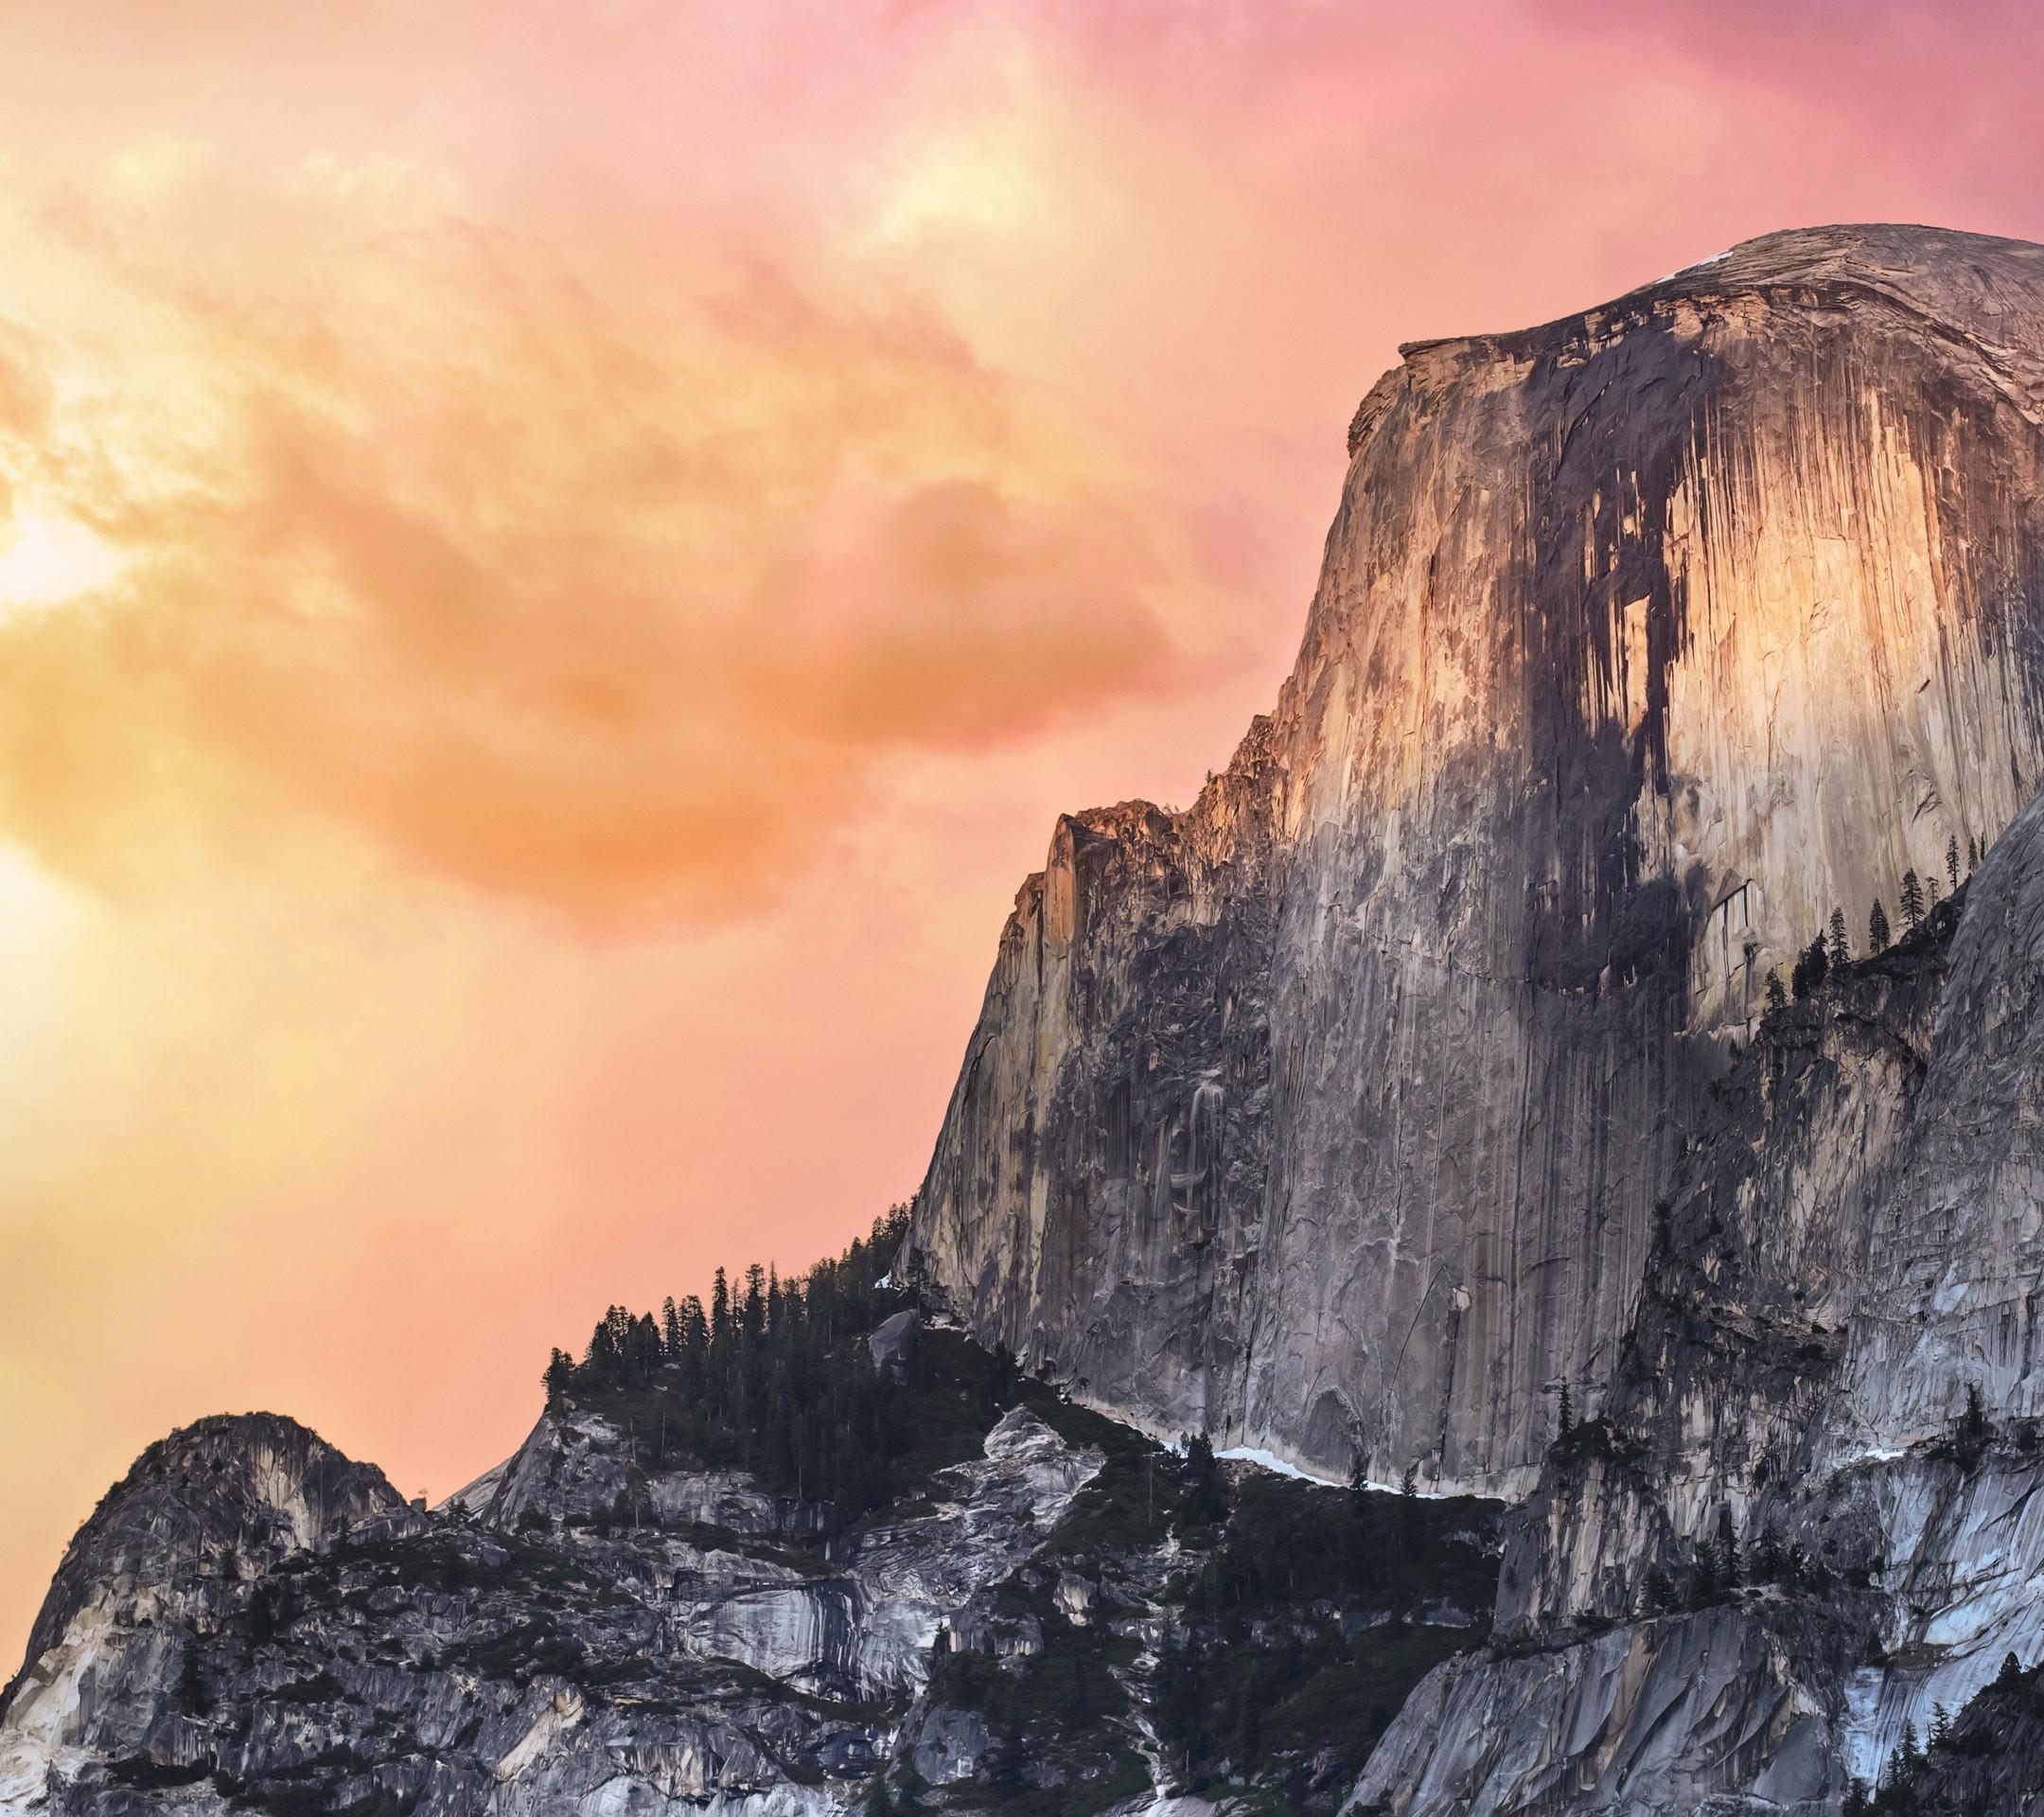 Mac Desktop Backgrounds (64+ images)